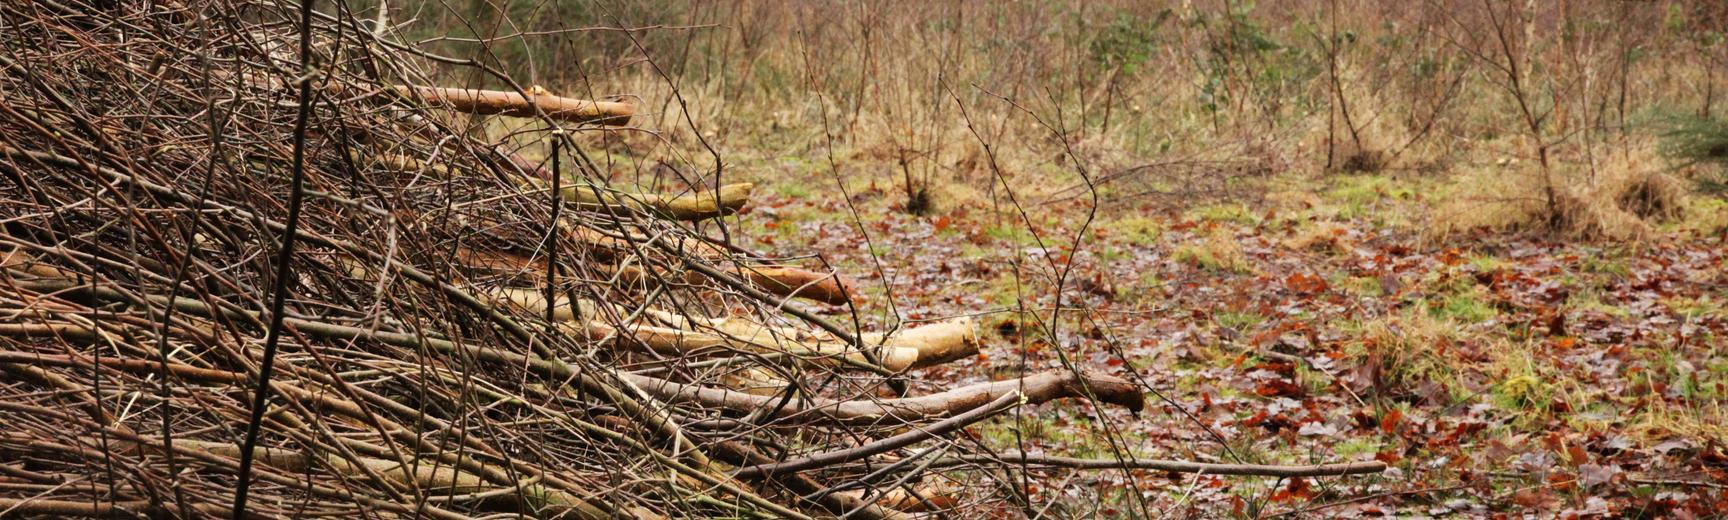 coppiced birch